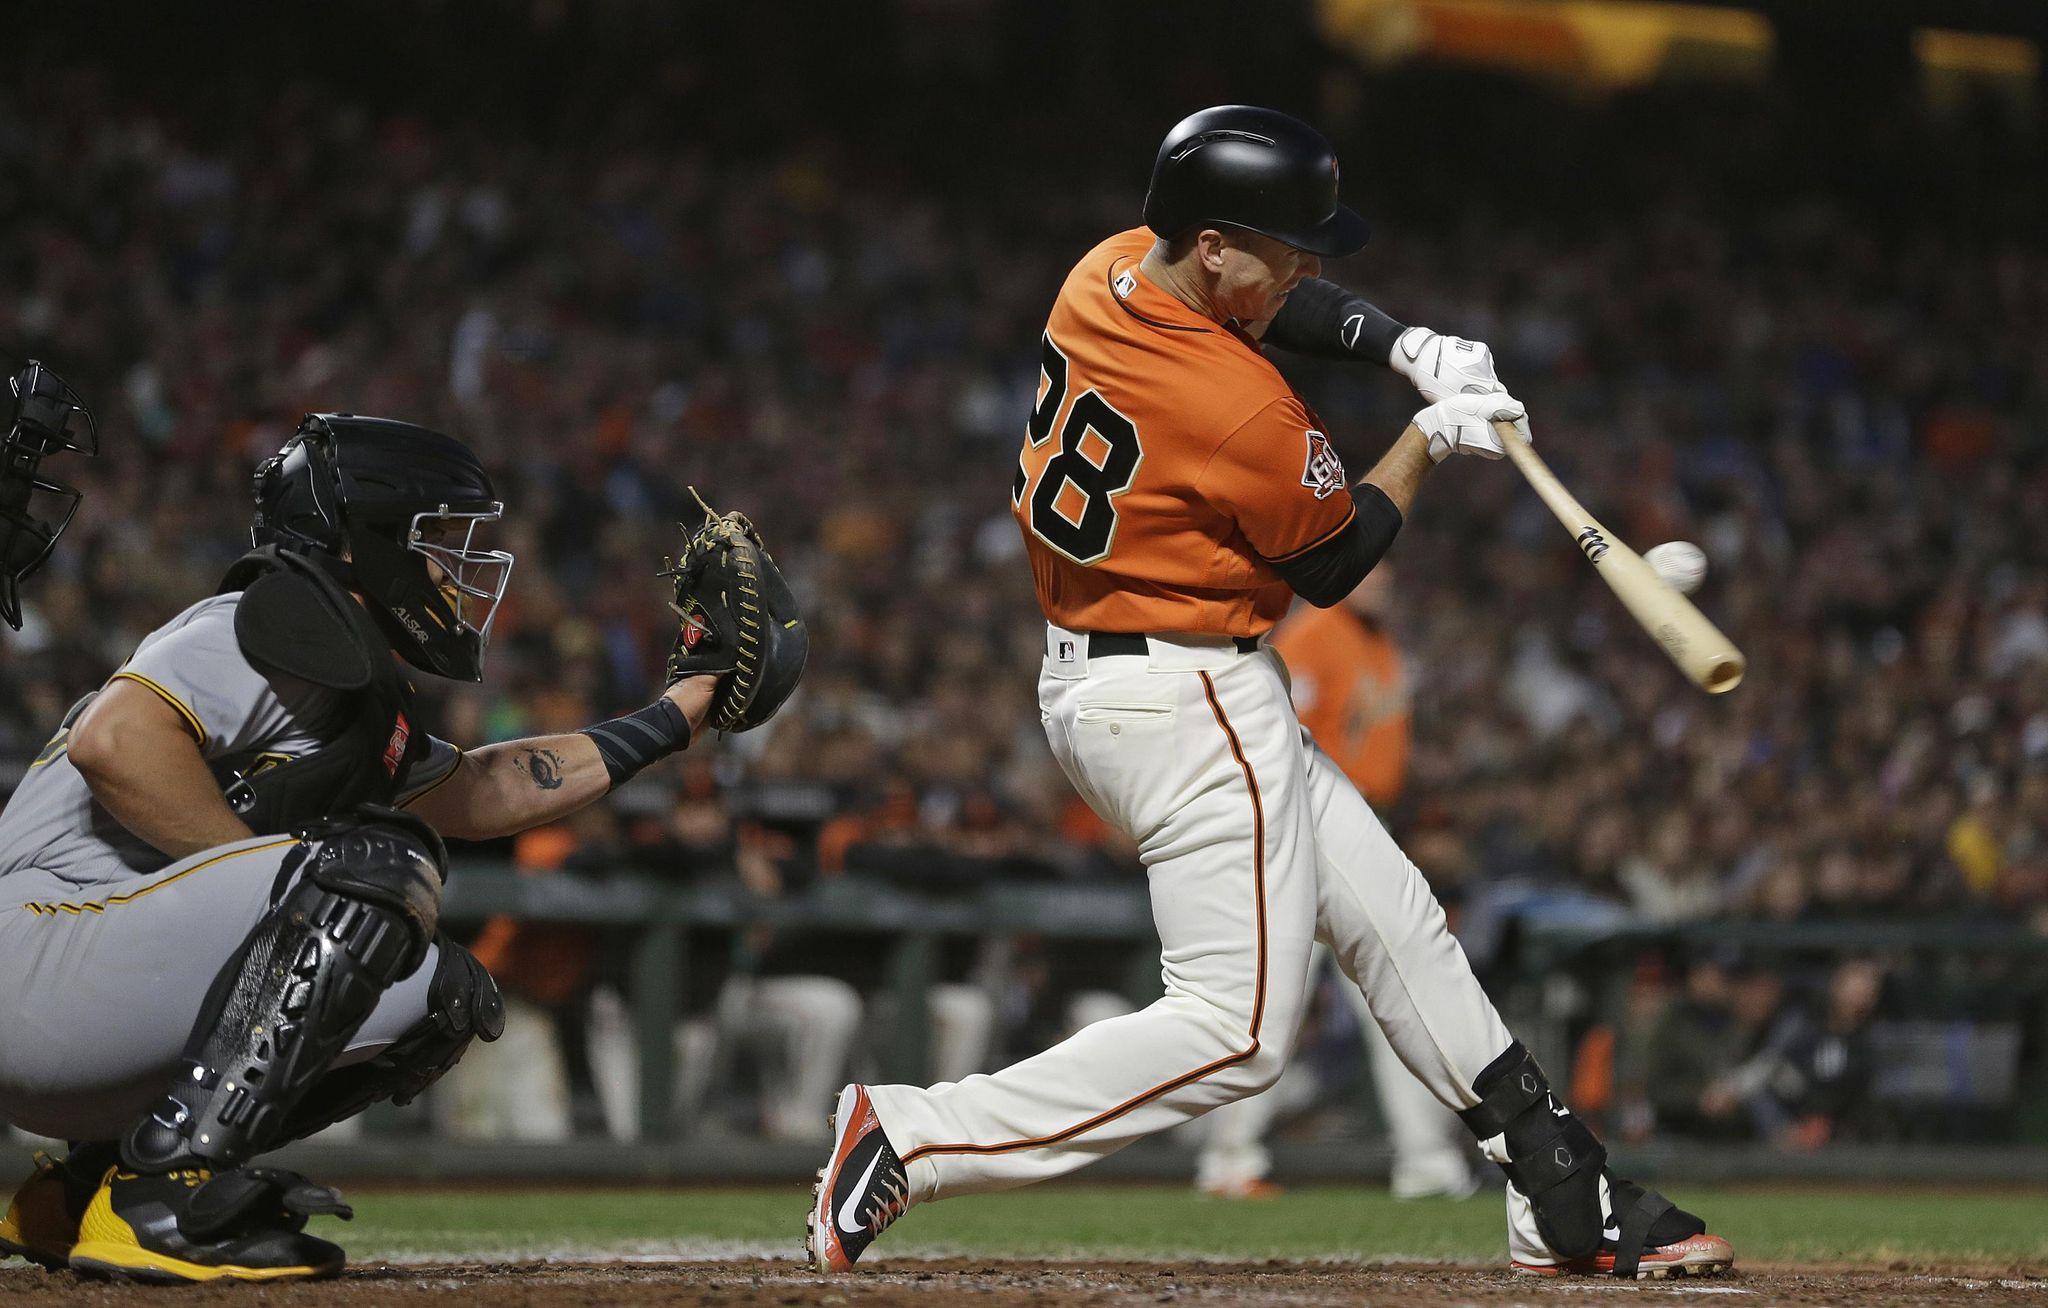 Pirates_giants_baseball_27161_s2048x1308